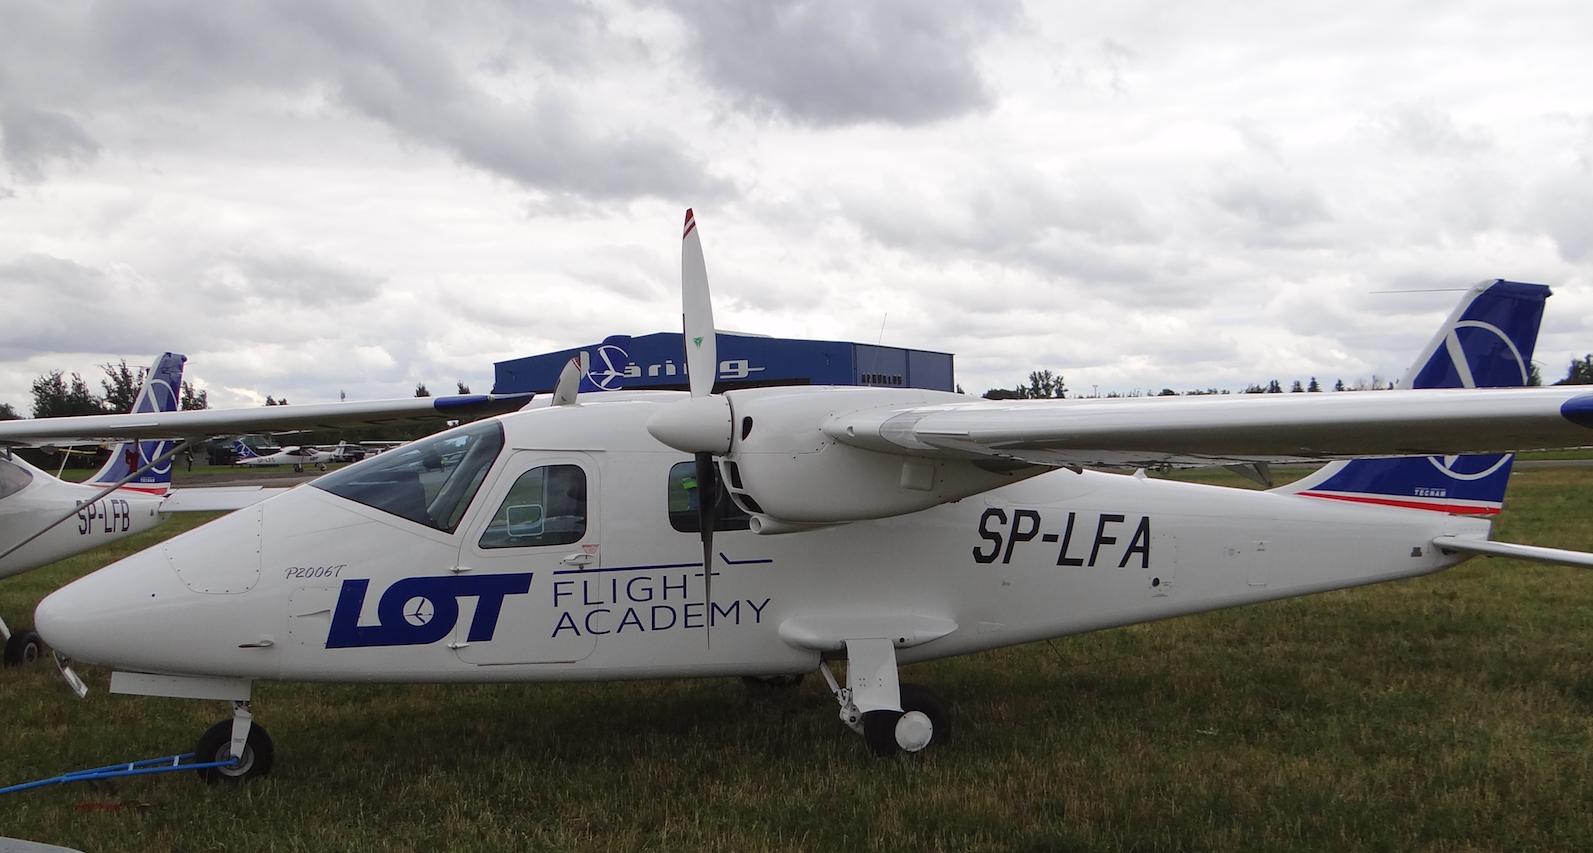 Samolot szkolny PLL LOT Tecnam P2006T SP-LFA. 2018 rok.Zdjęcie Karol Placha Hetman